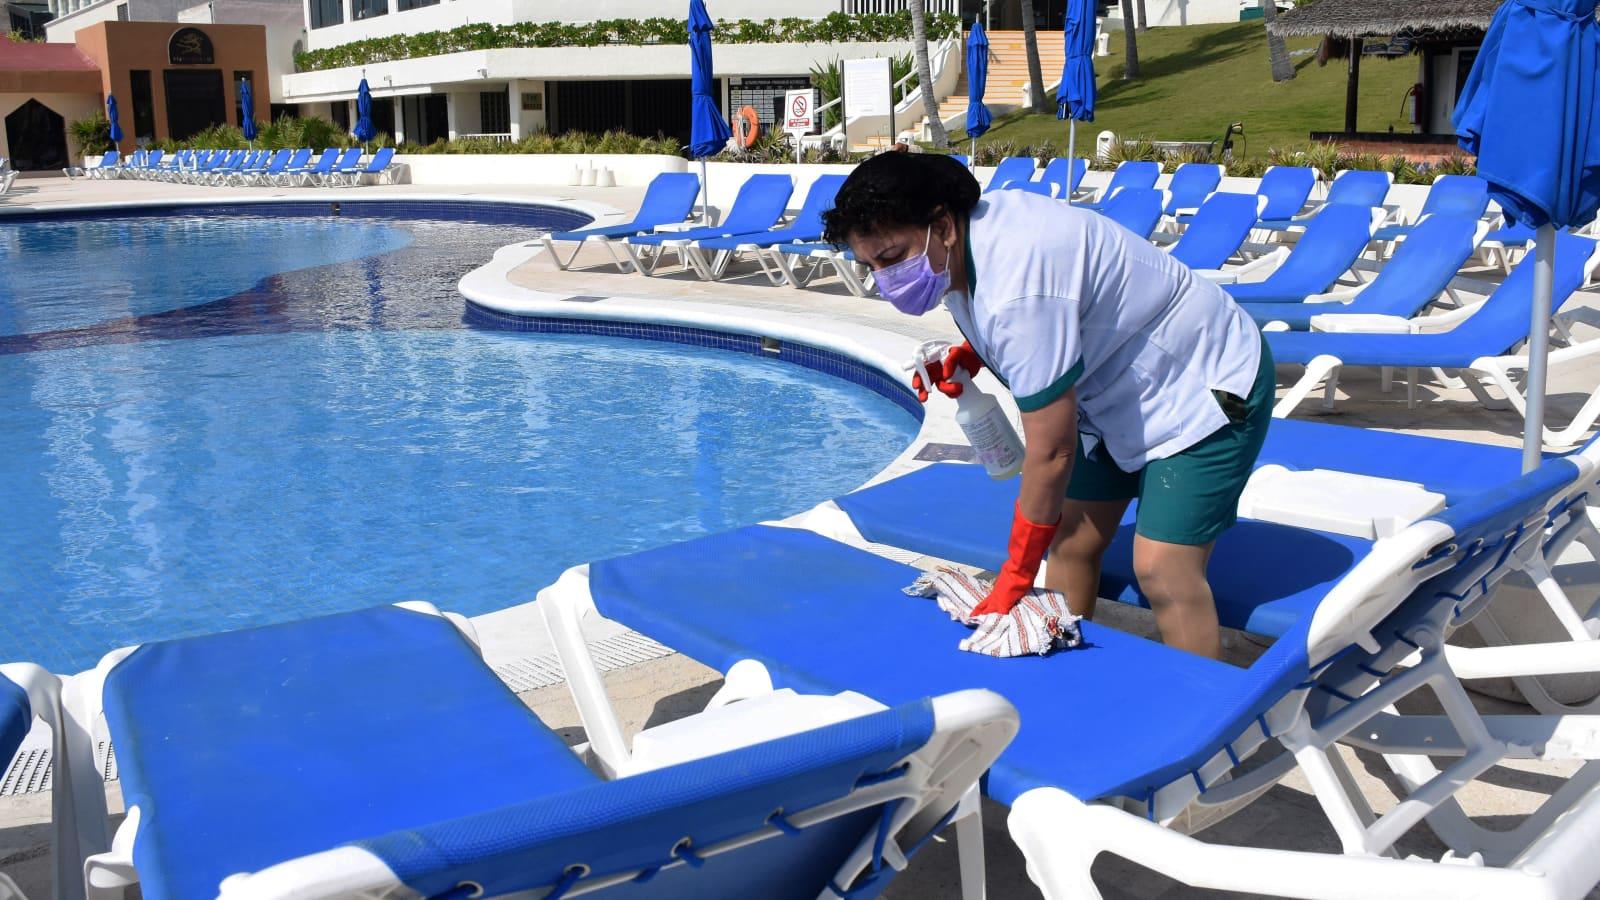 Covid Testing Hotels Scramble As U S Changes Flight Requirements